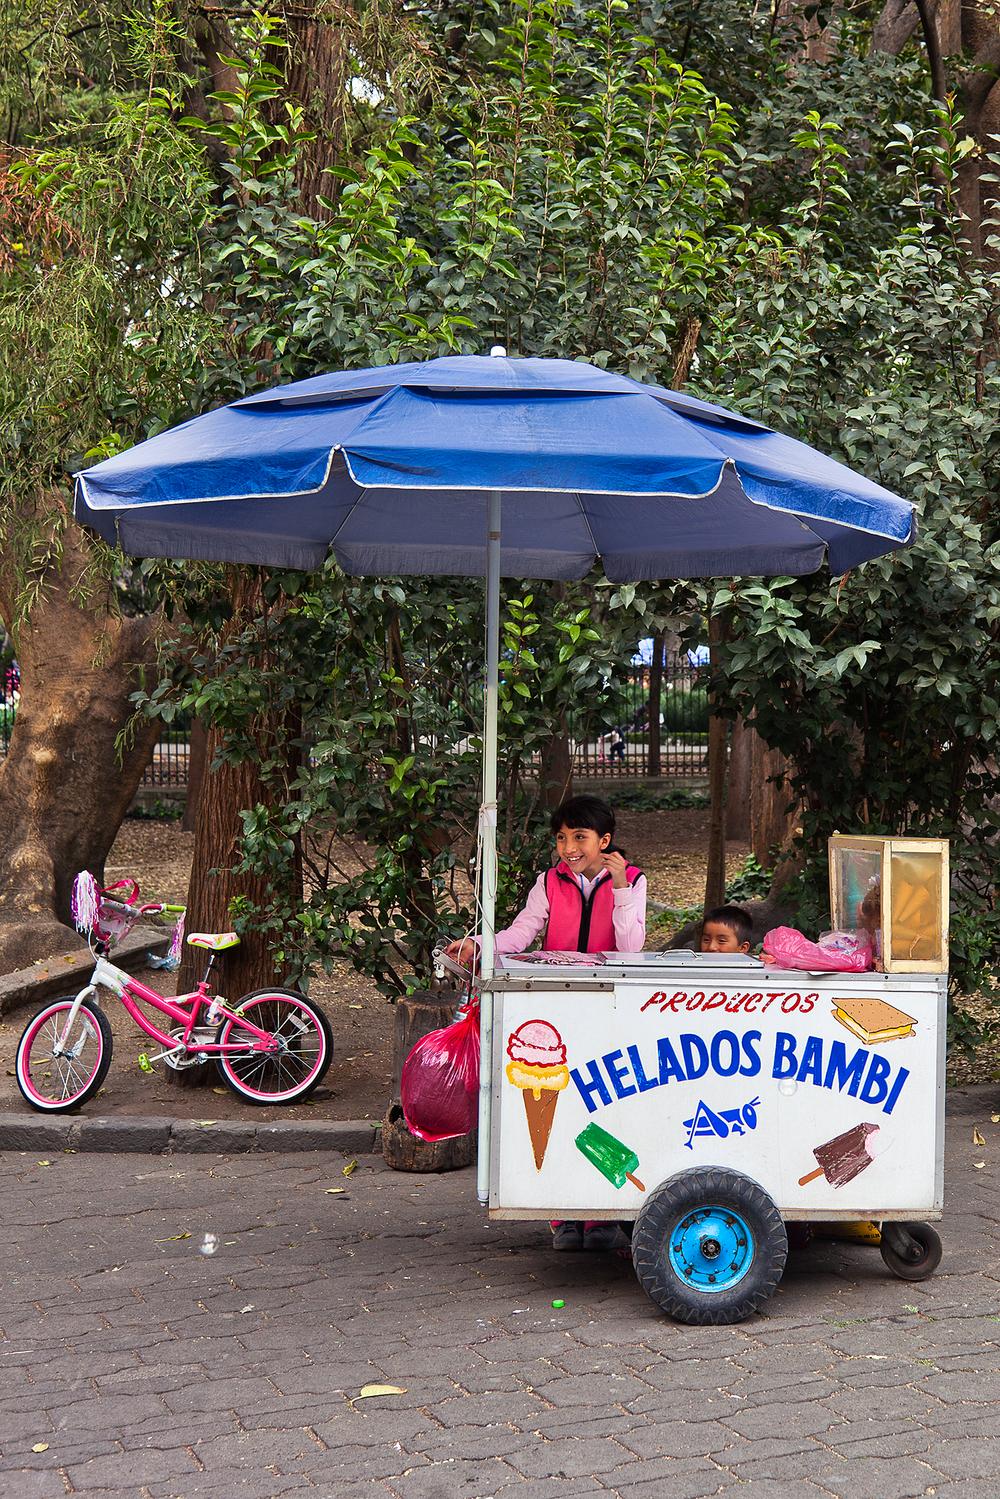 productos helados bambi chapultepec park mexico city mx.jpg